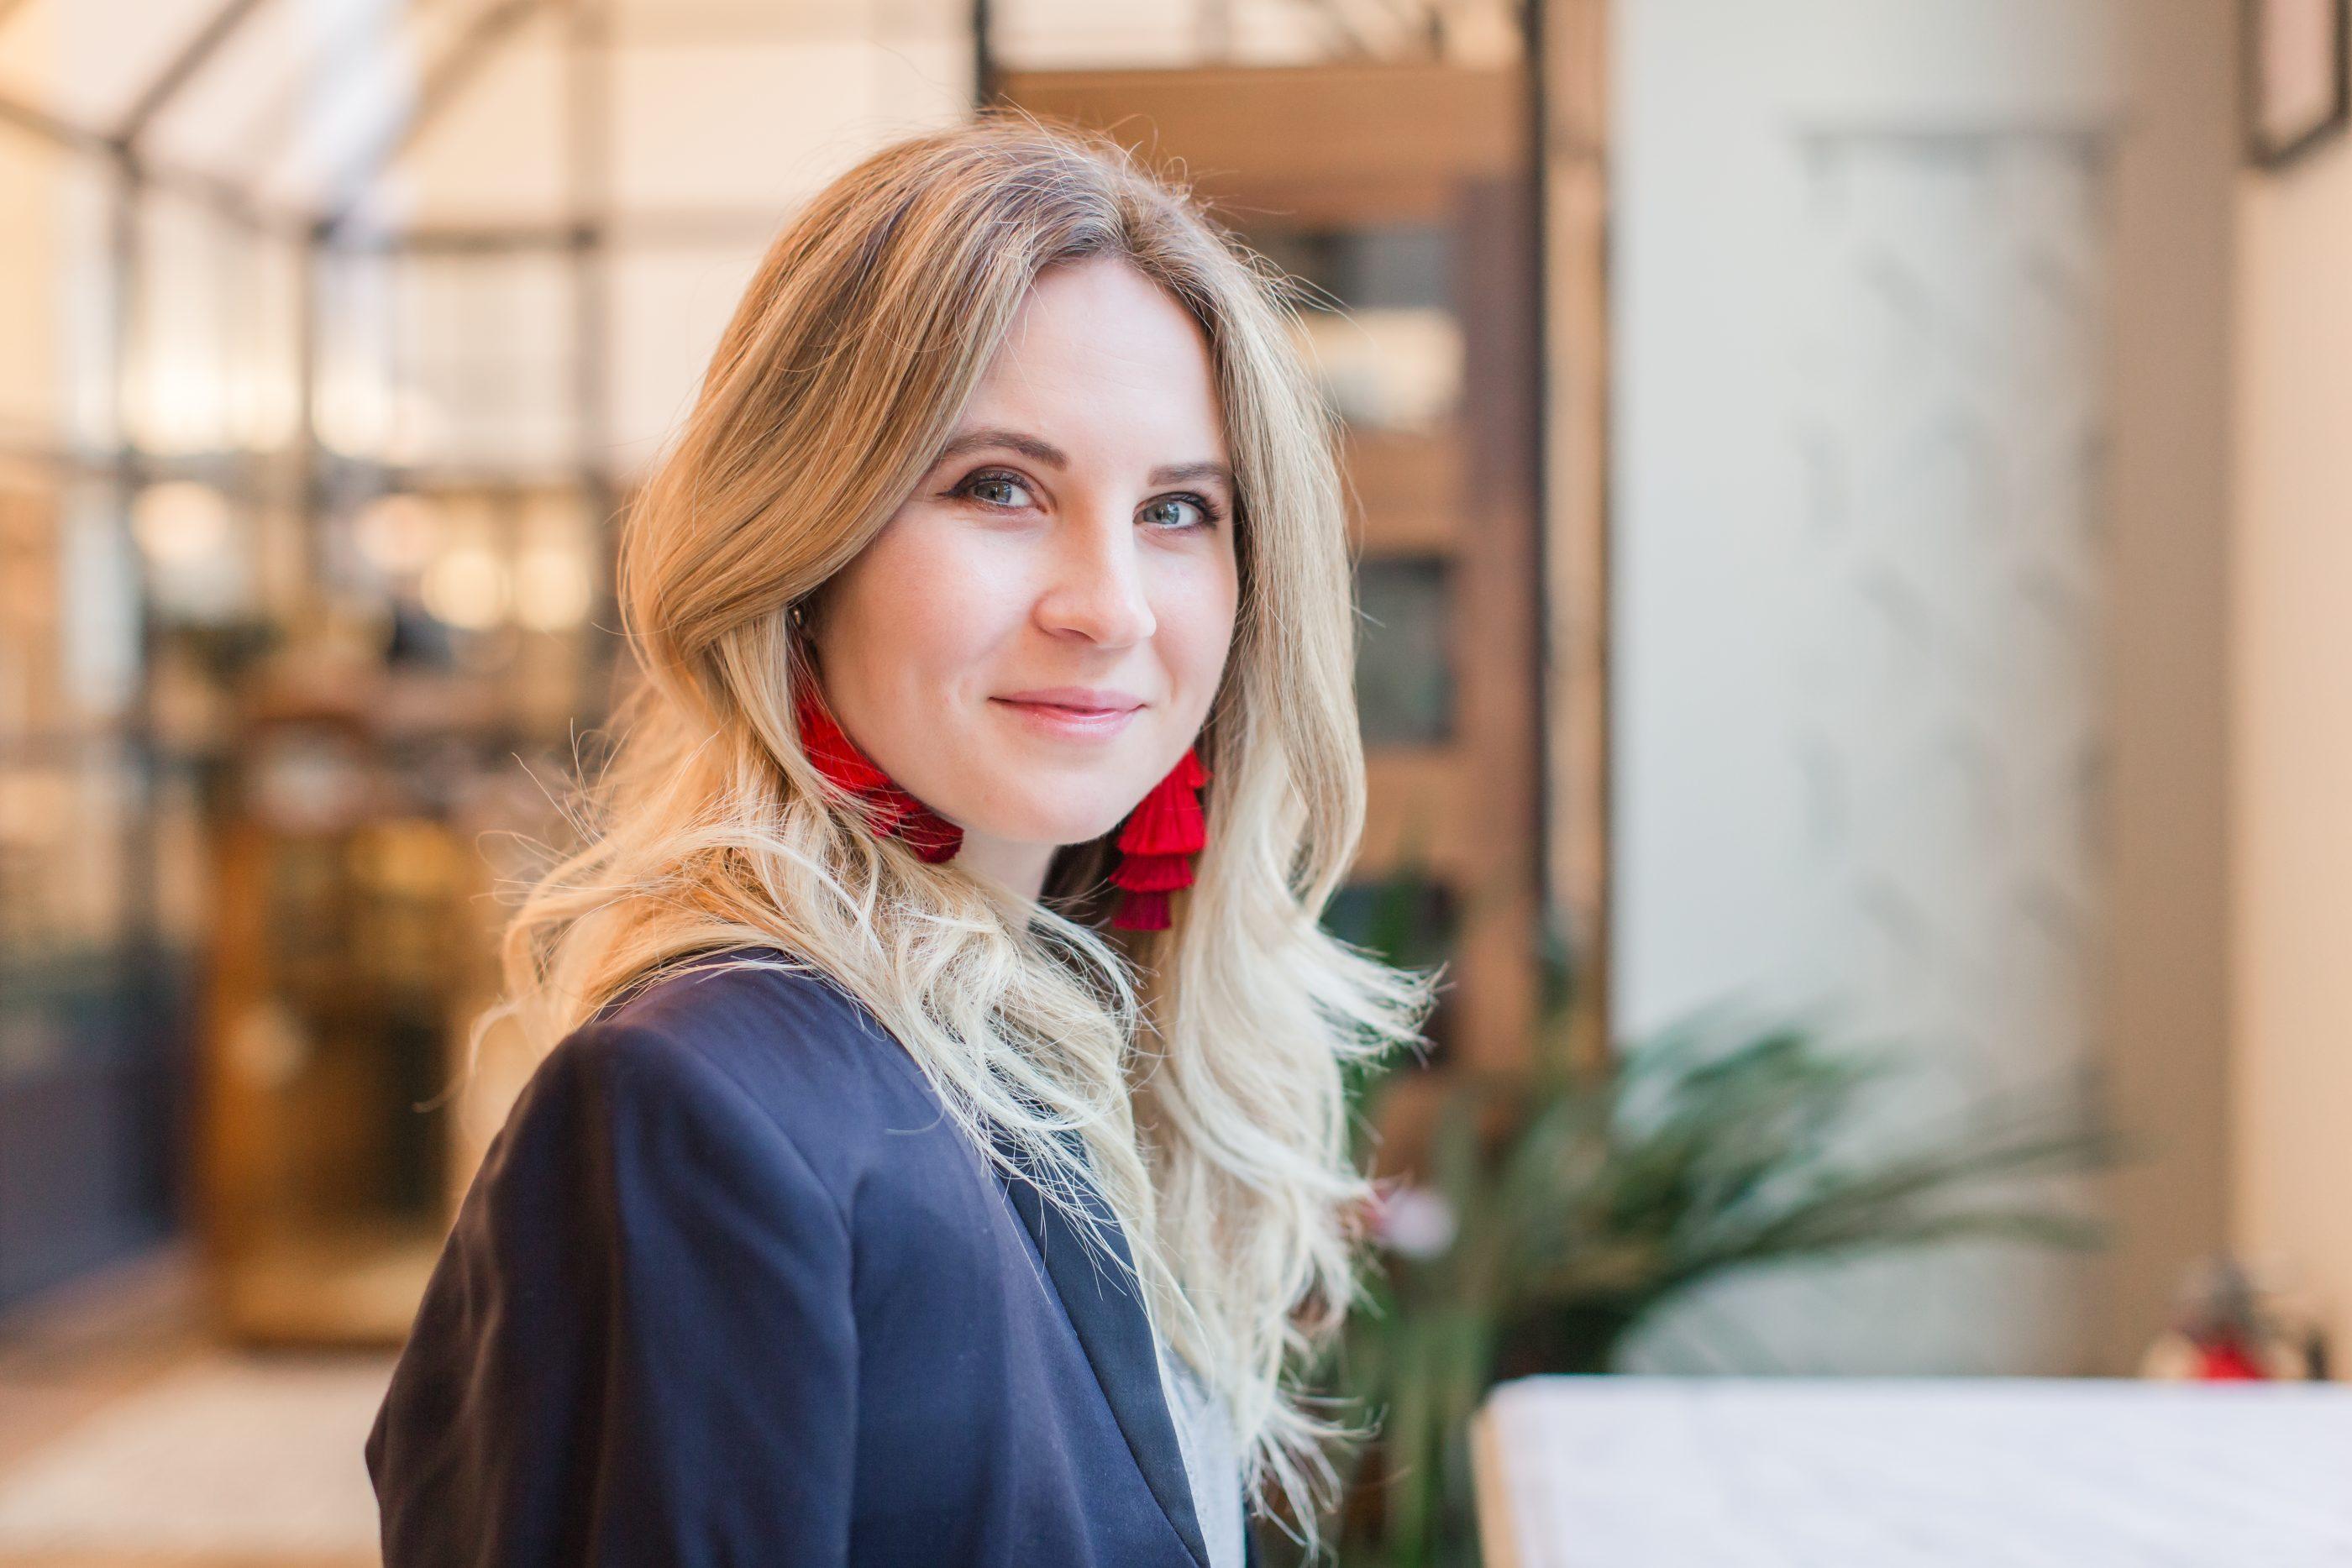 beauty concierge service - luxury beauty planning